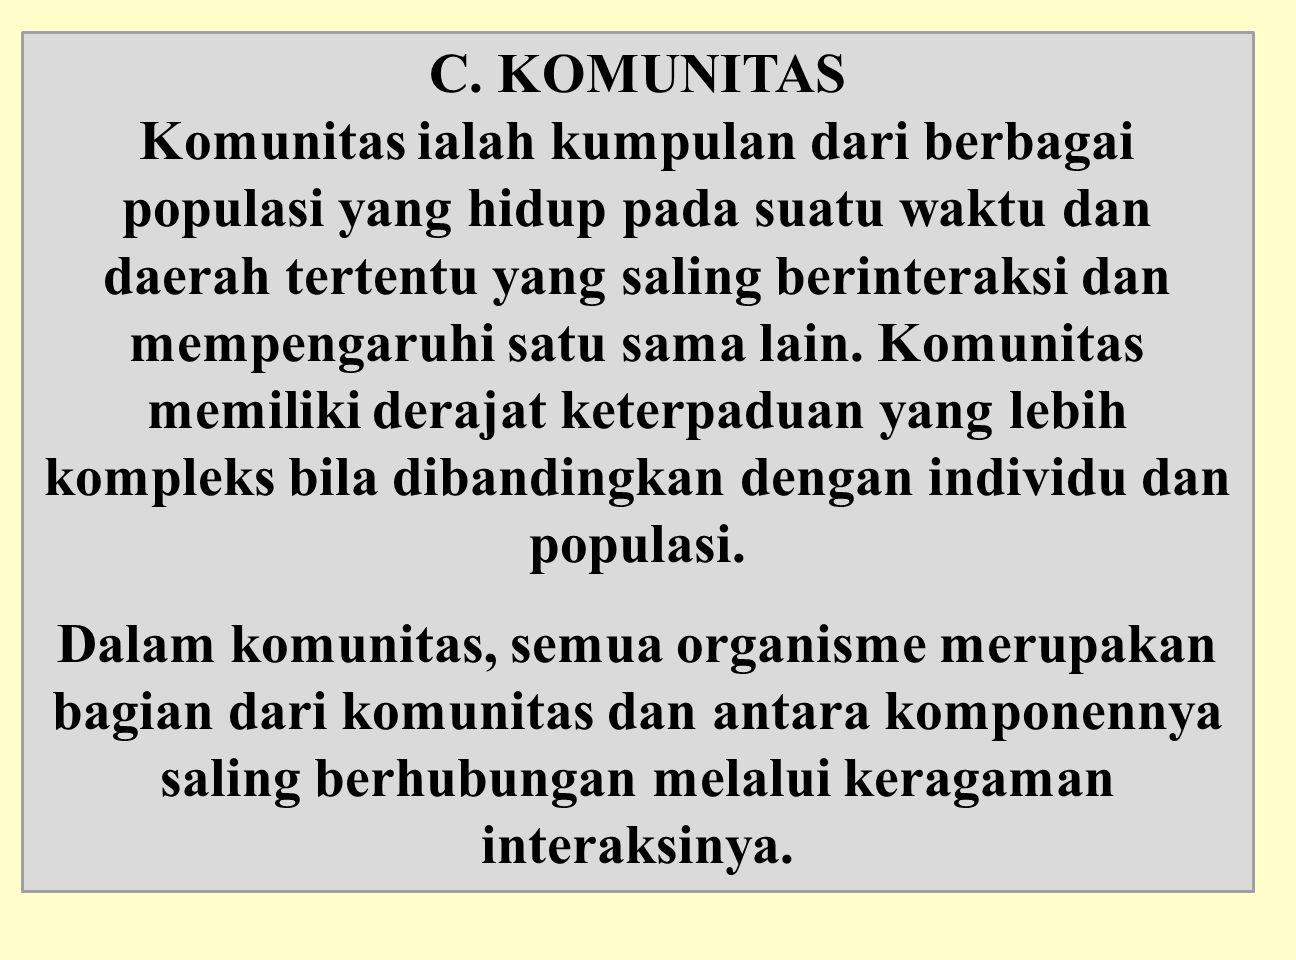 C. KOMUNITAS